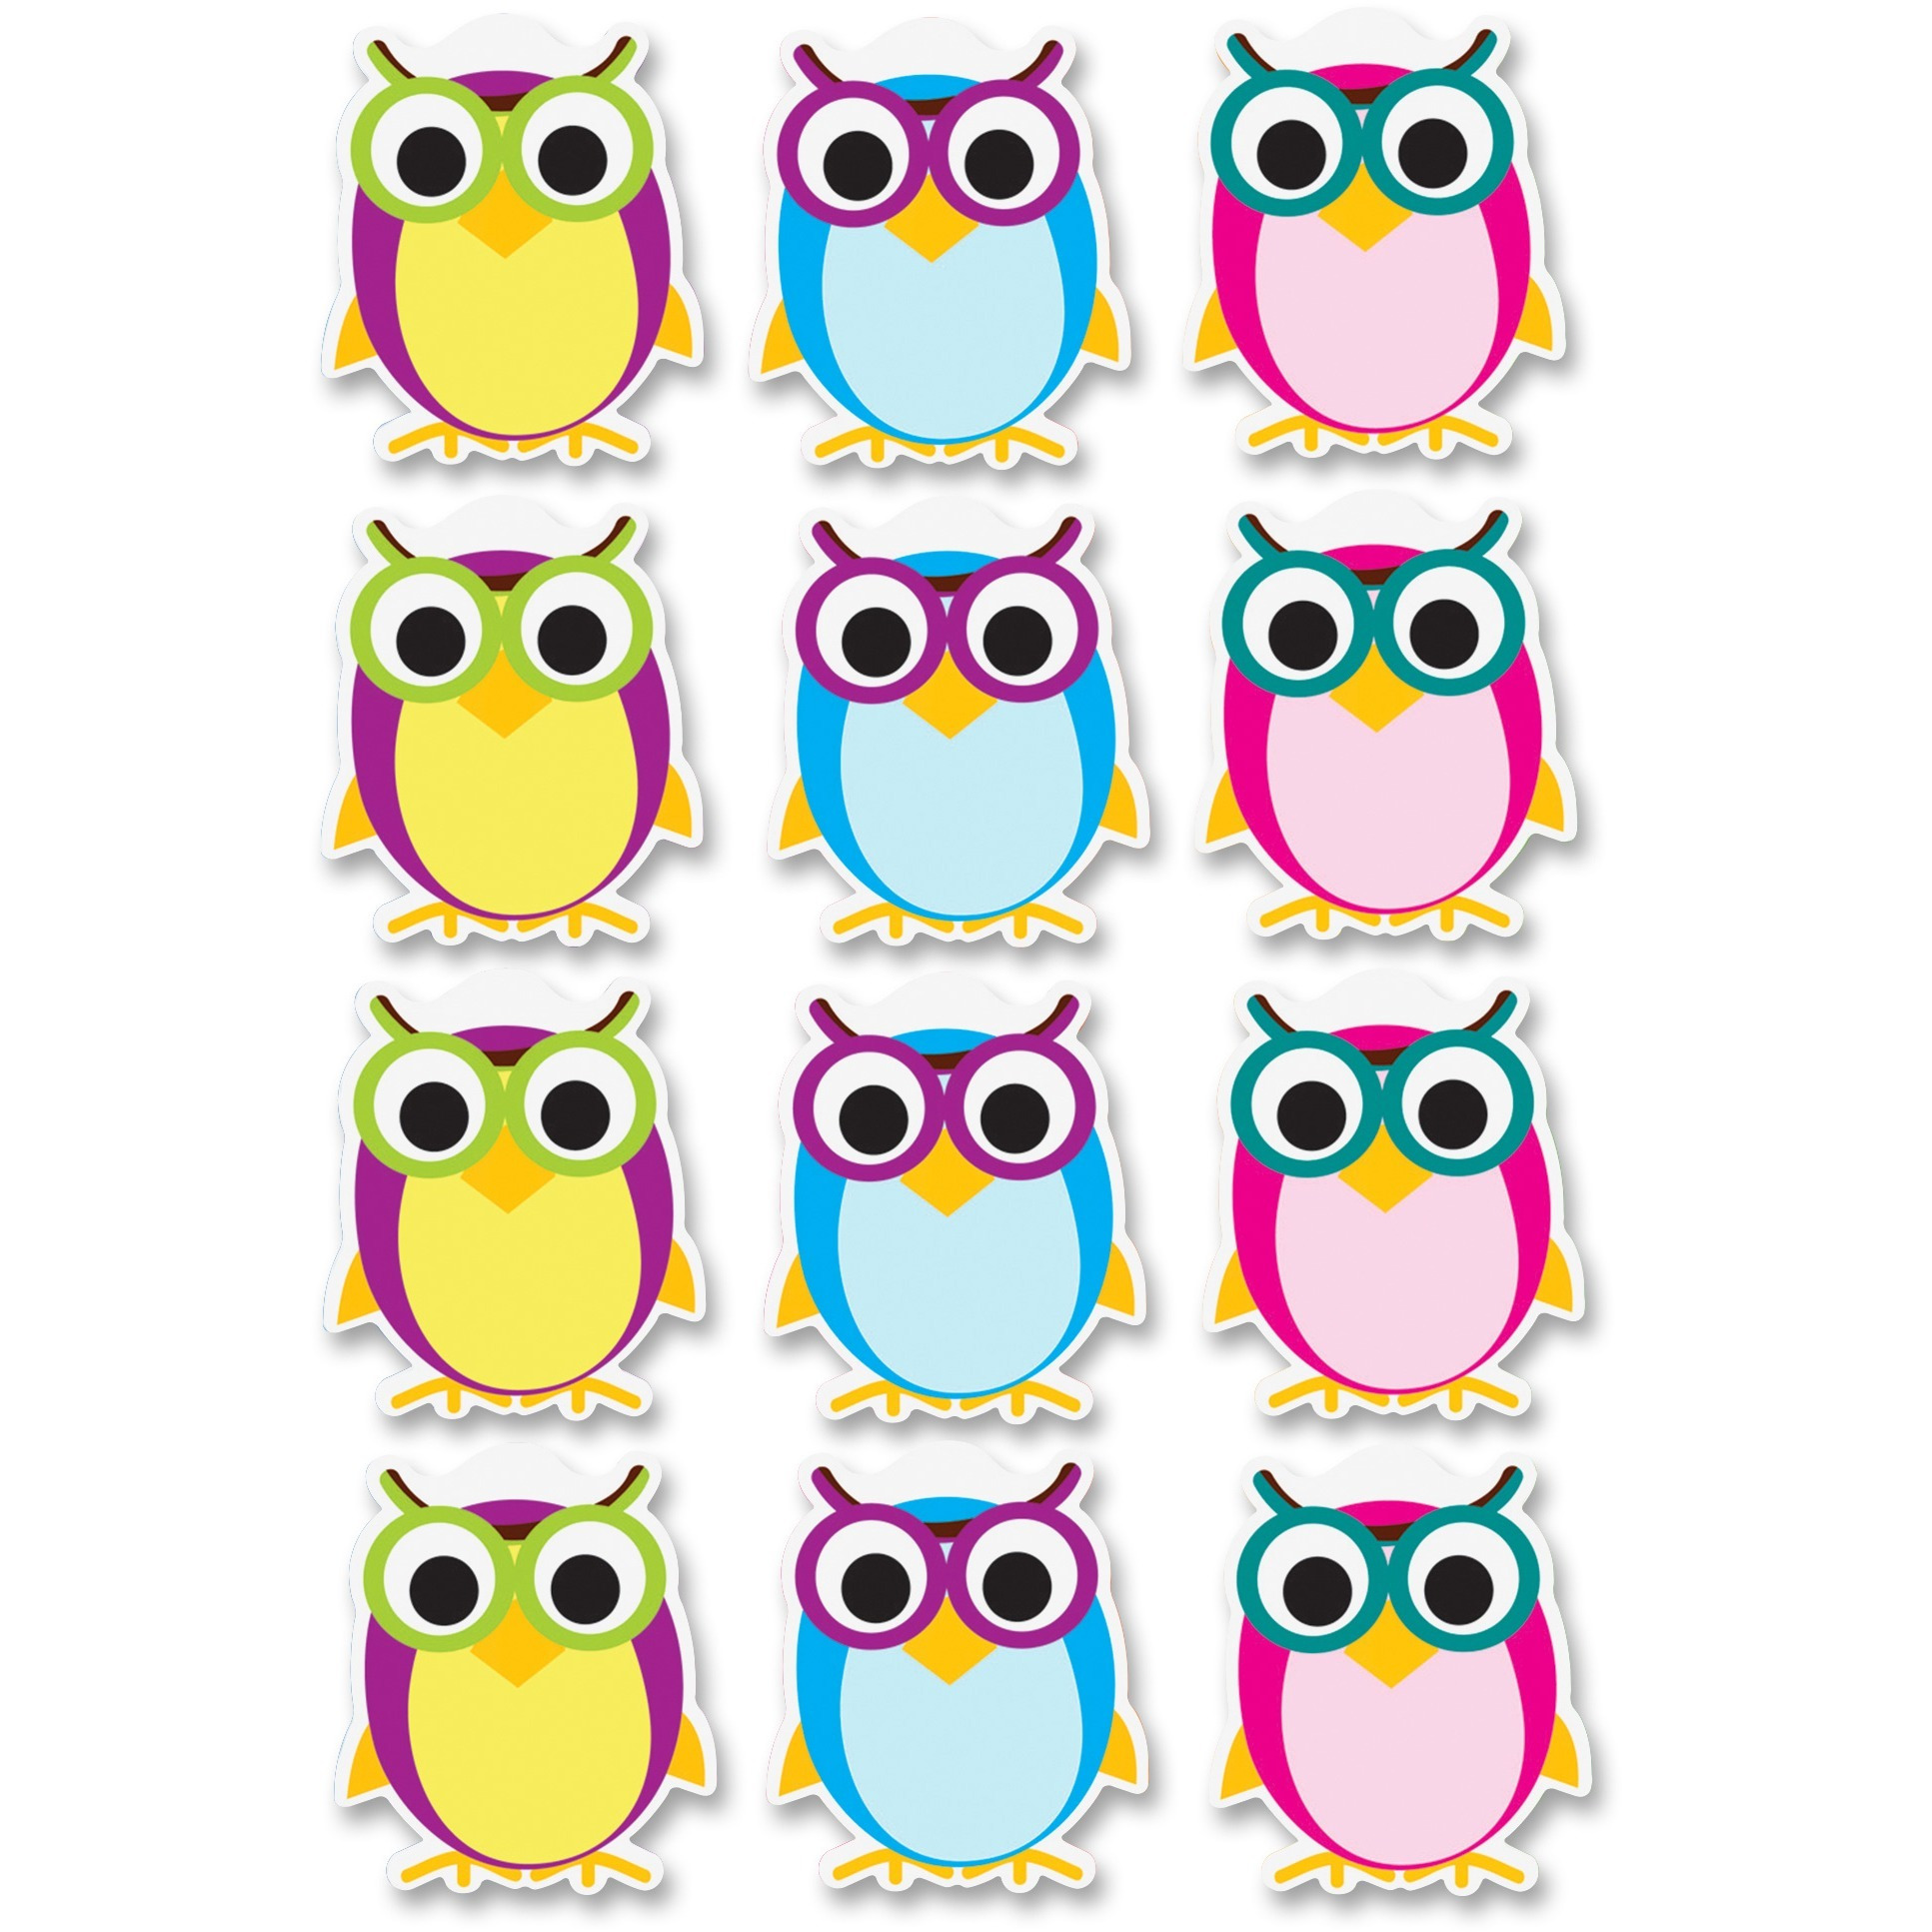 Ashley, ASH10142, Dry Erase Owl Magnets, 12 Piece, Multicolor